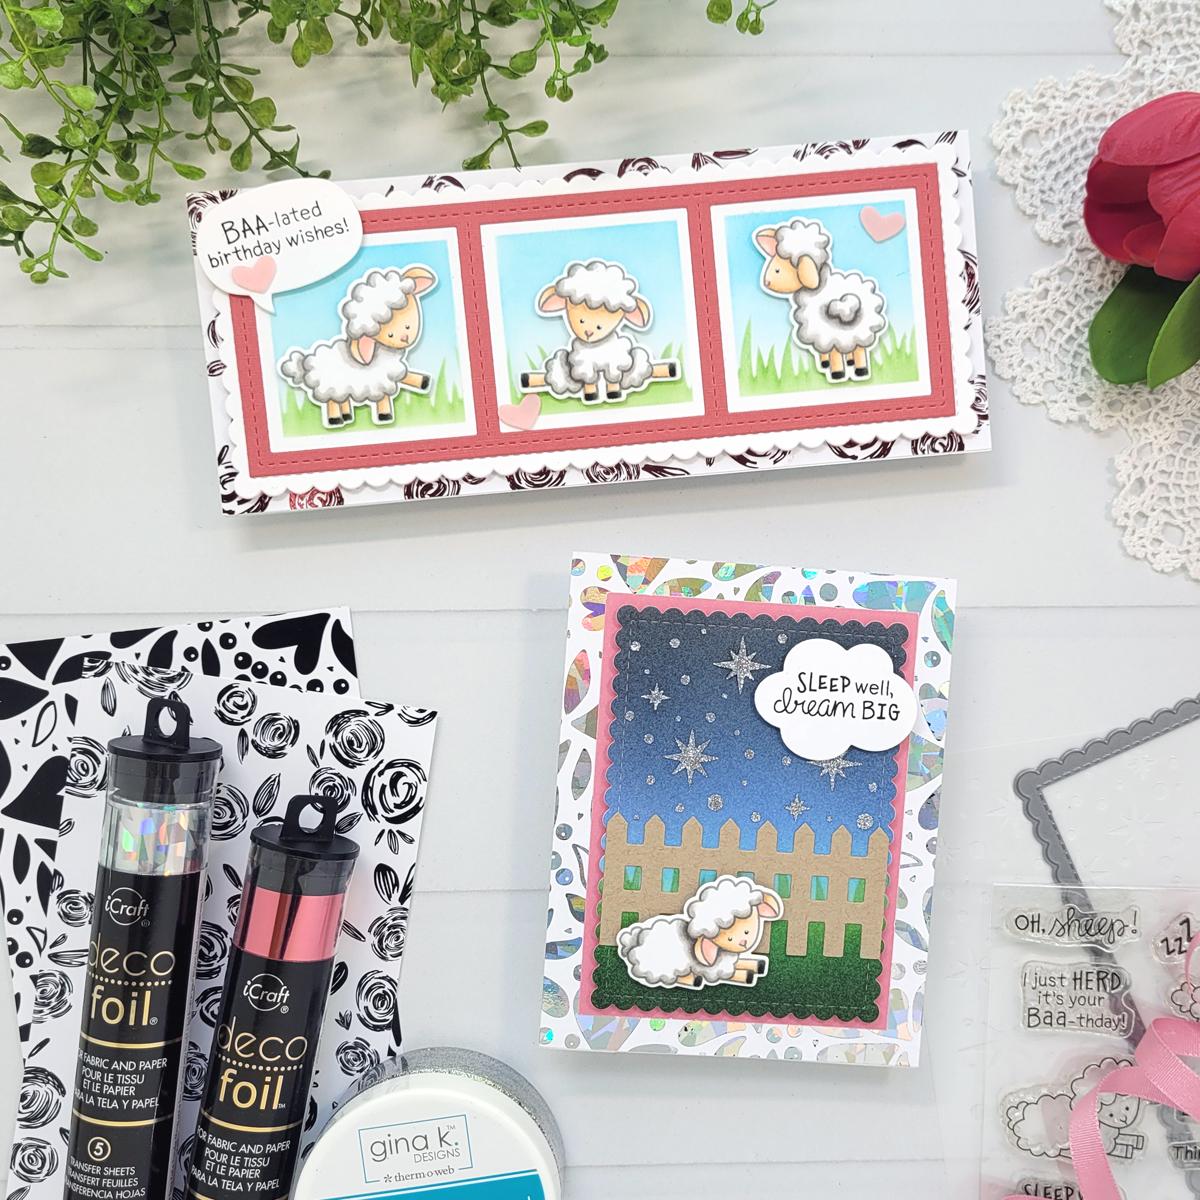 Andrea NND Baa Cards pic 1